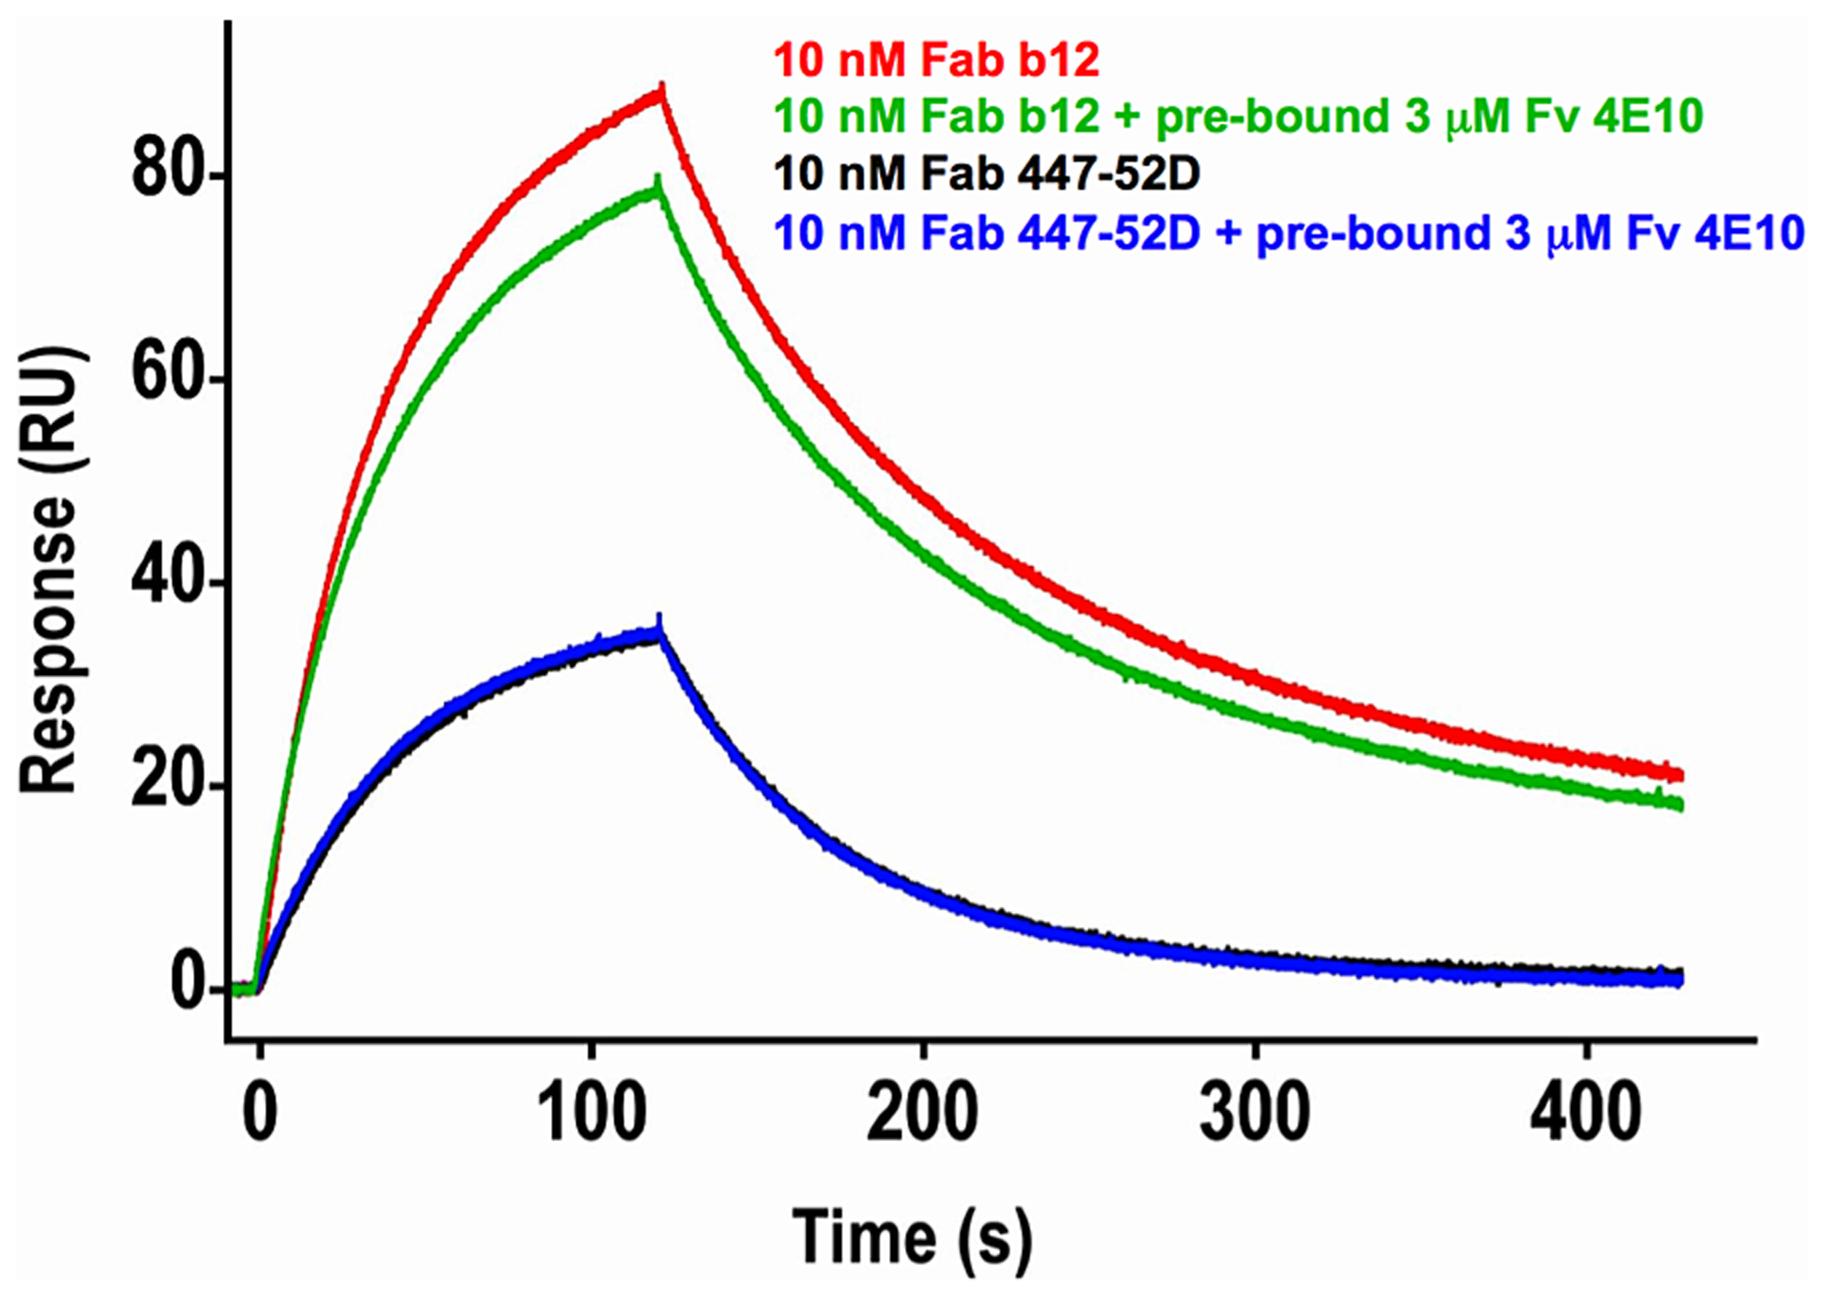 Effects of 4E10/gp140<sub>3</sub> pre-binding on 447-52D and b12 binding.